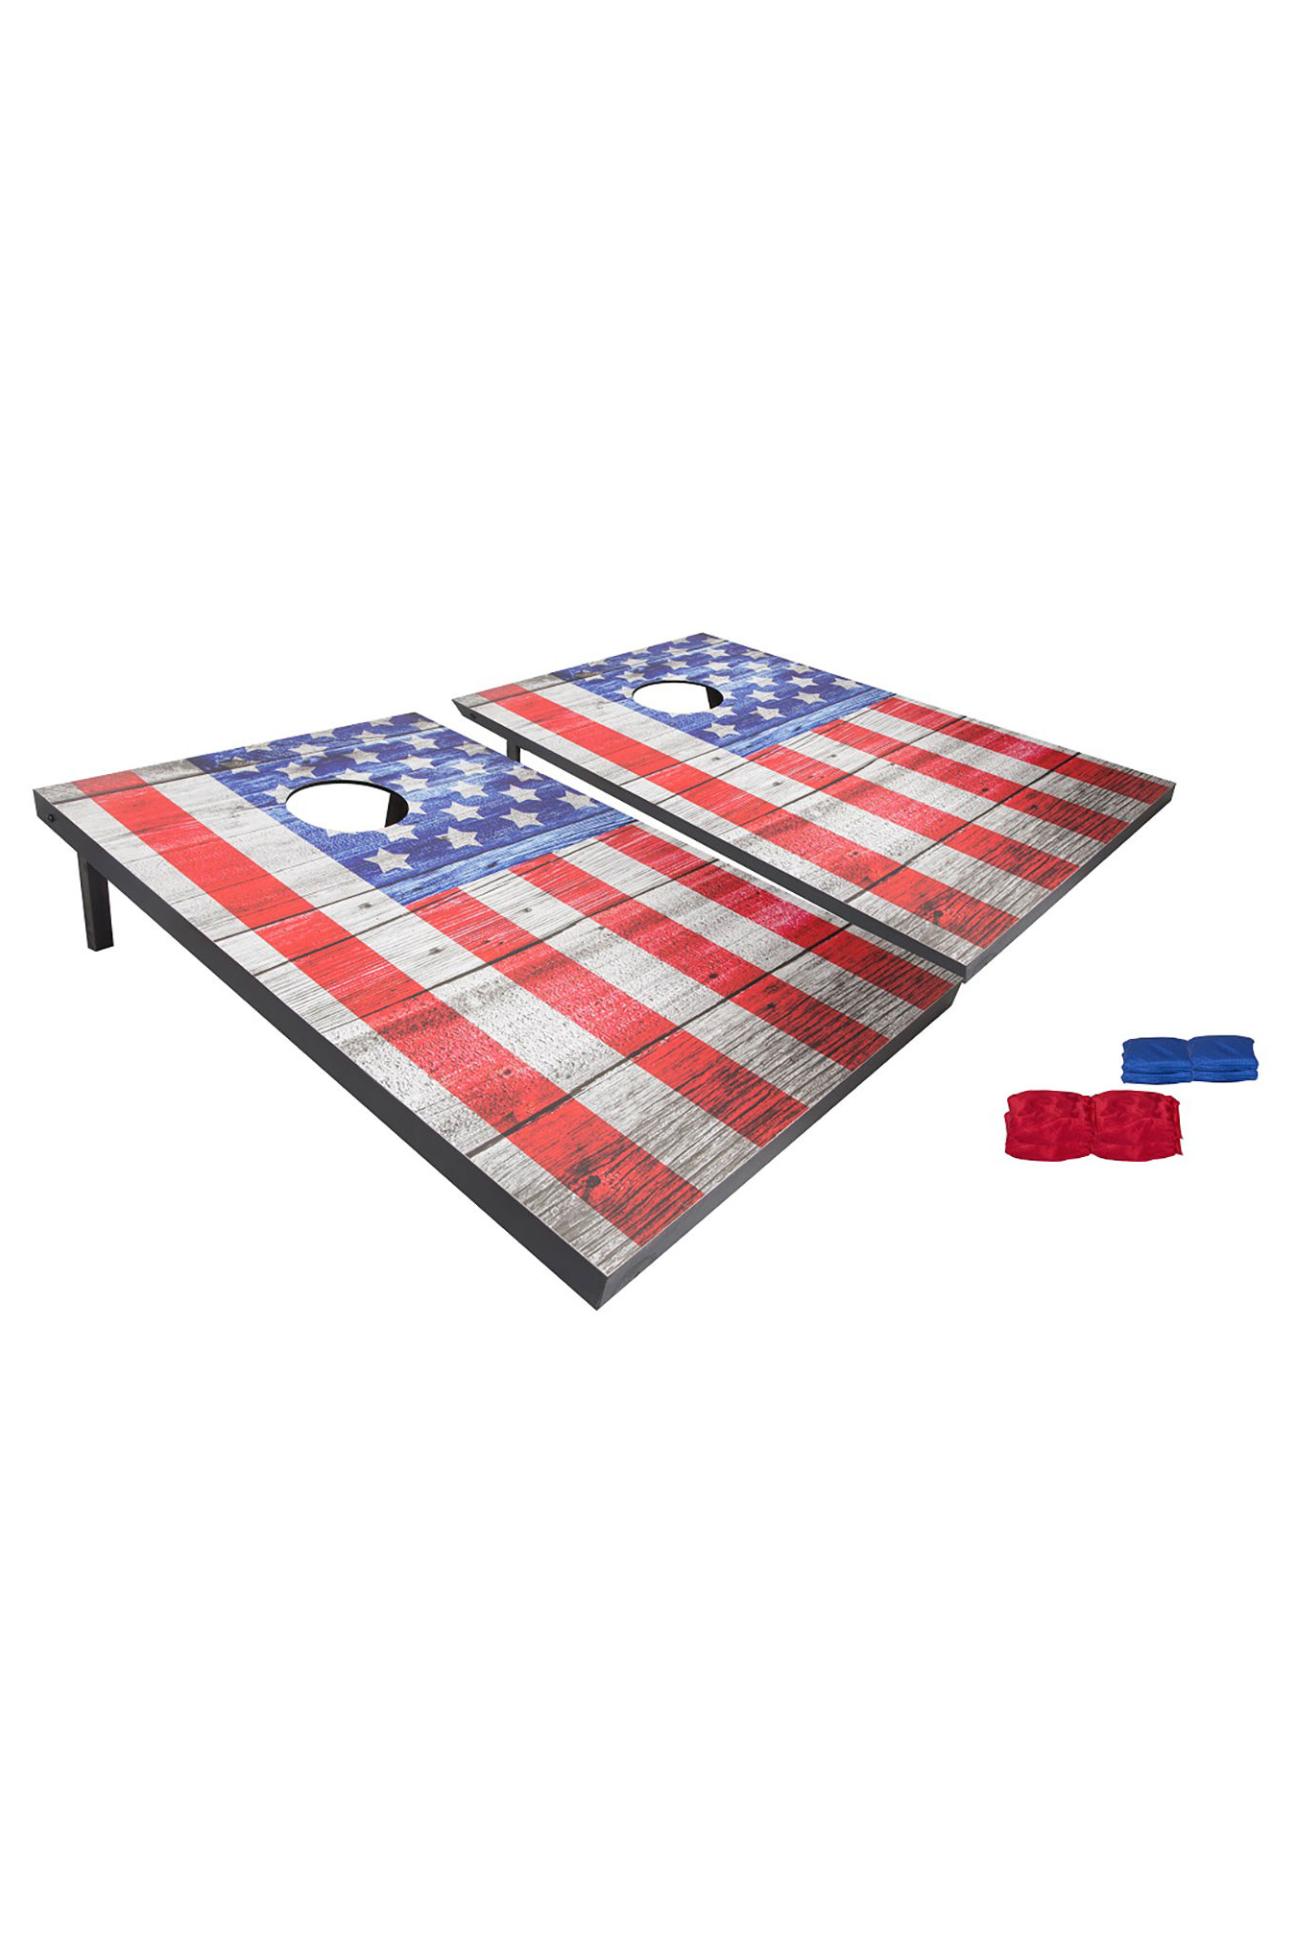 american flagcornhole boards